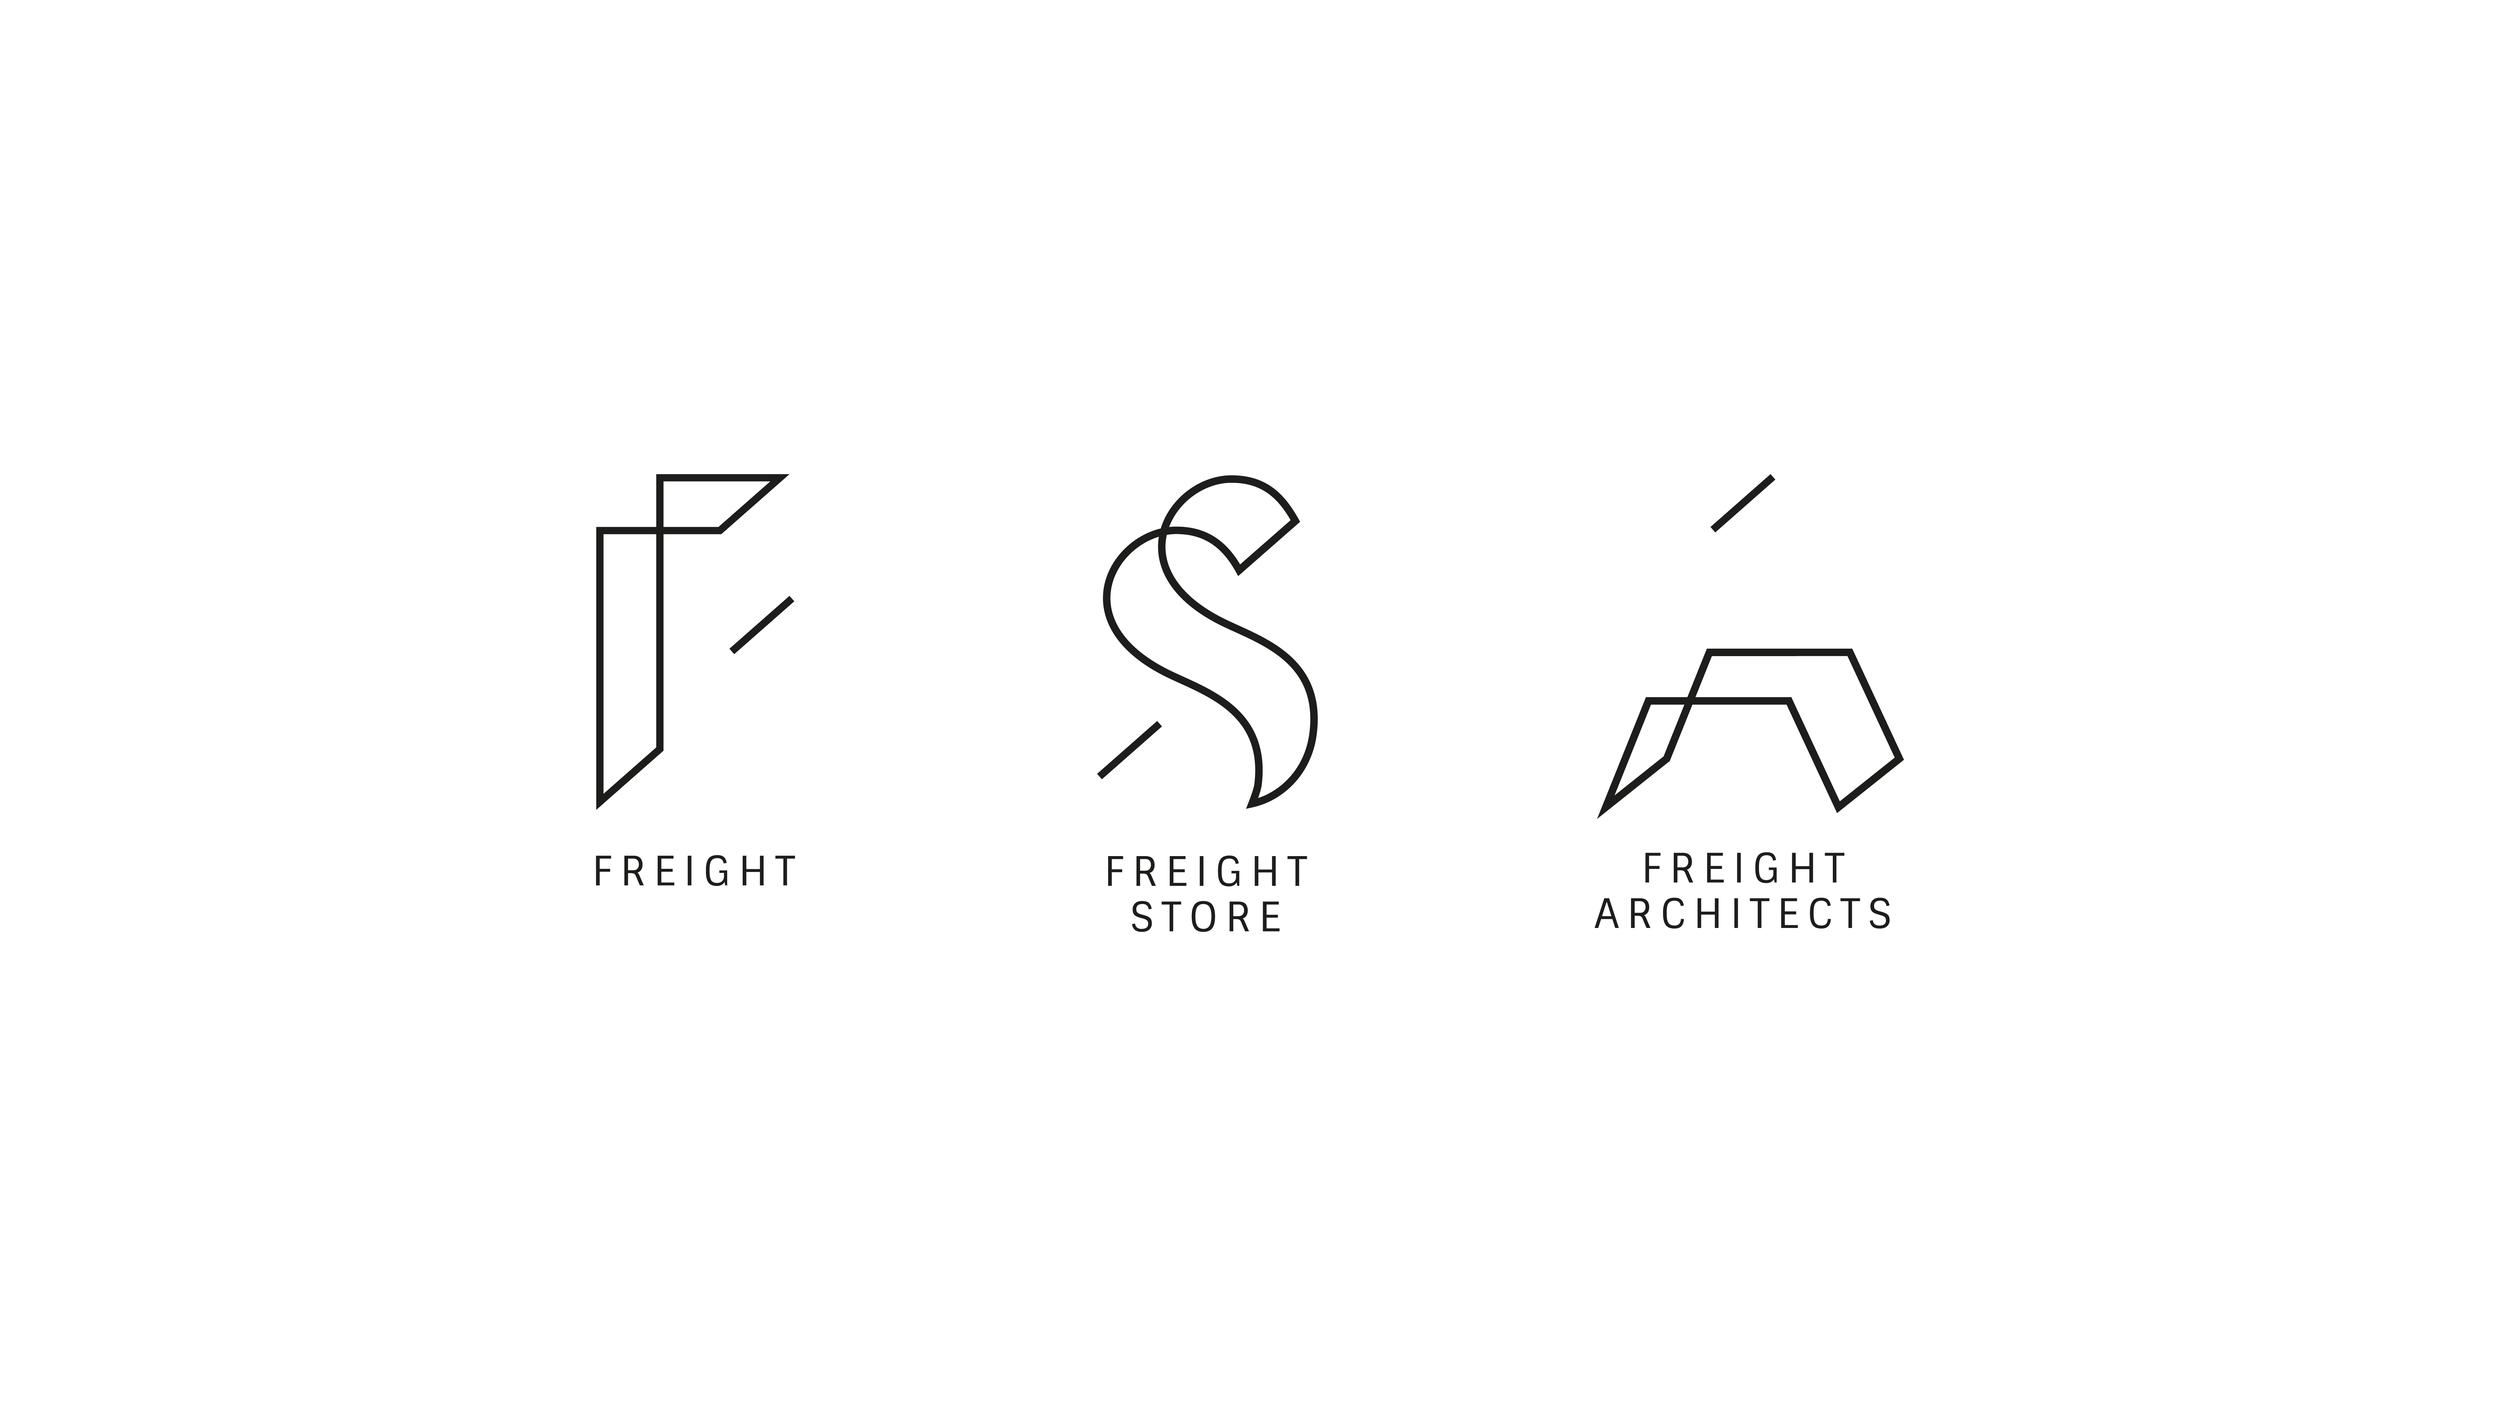 Warren Tey_01_Logo_Freight.png